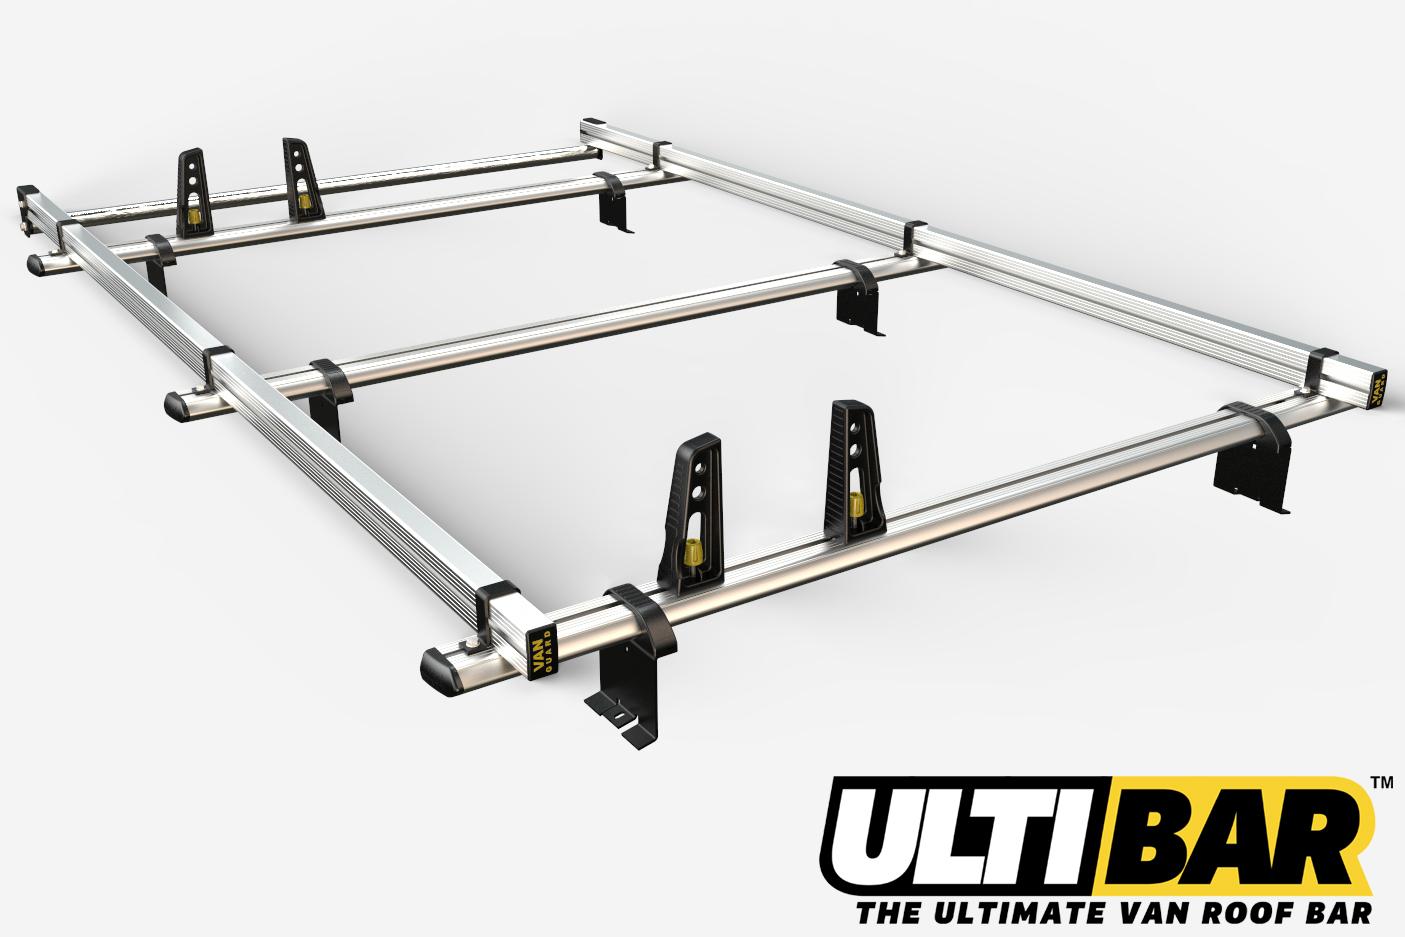 Citroen Dispatch (pre Feb '07) - 3 Bar Heavy Duty Aluminium Roof Rack with Full Roller (8x4 Capacity)